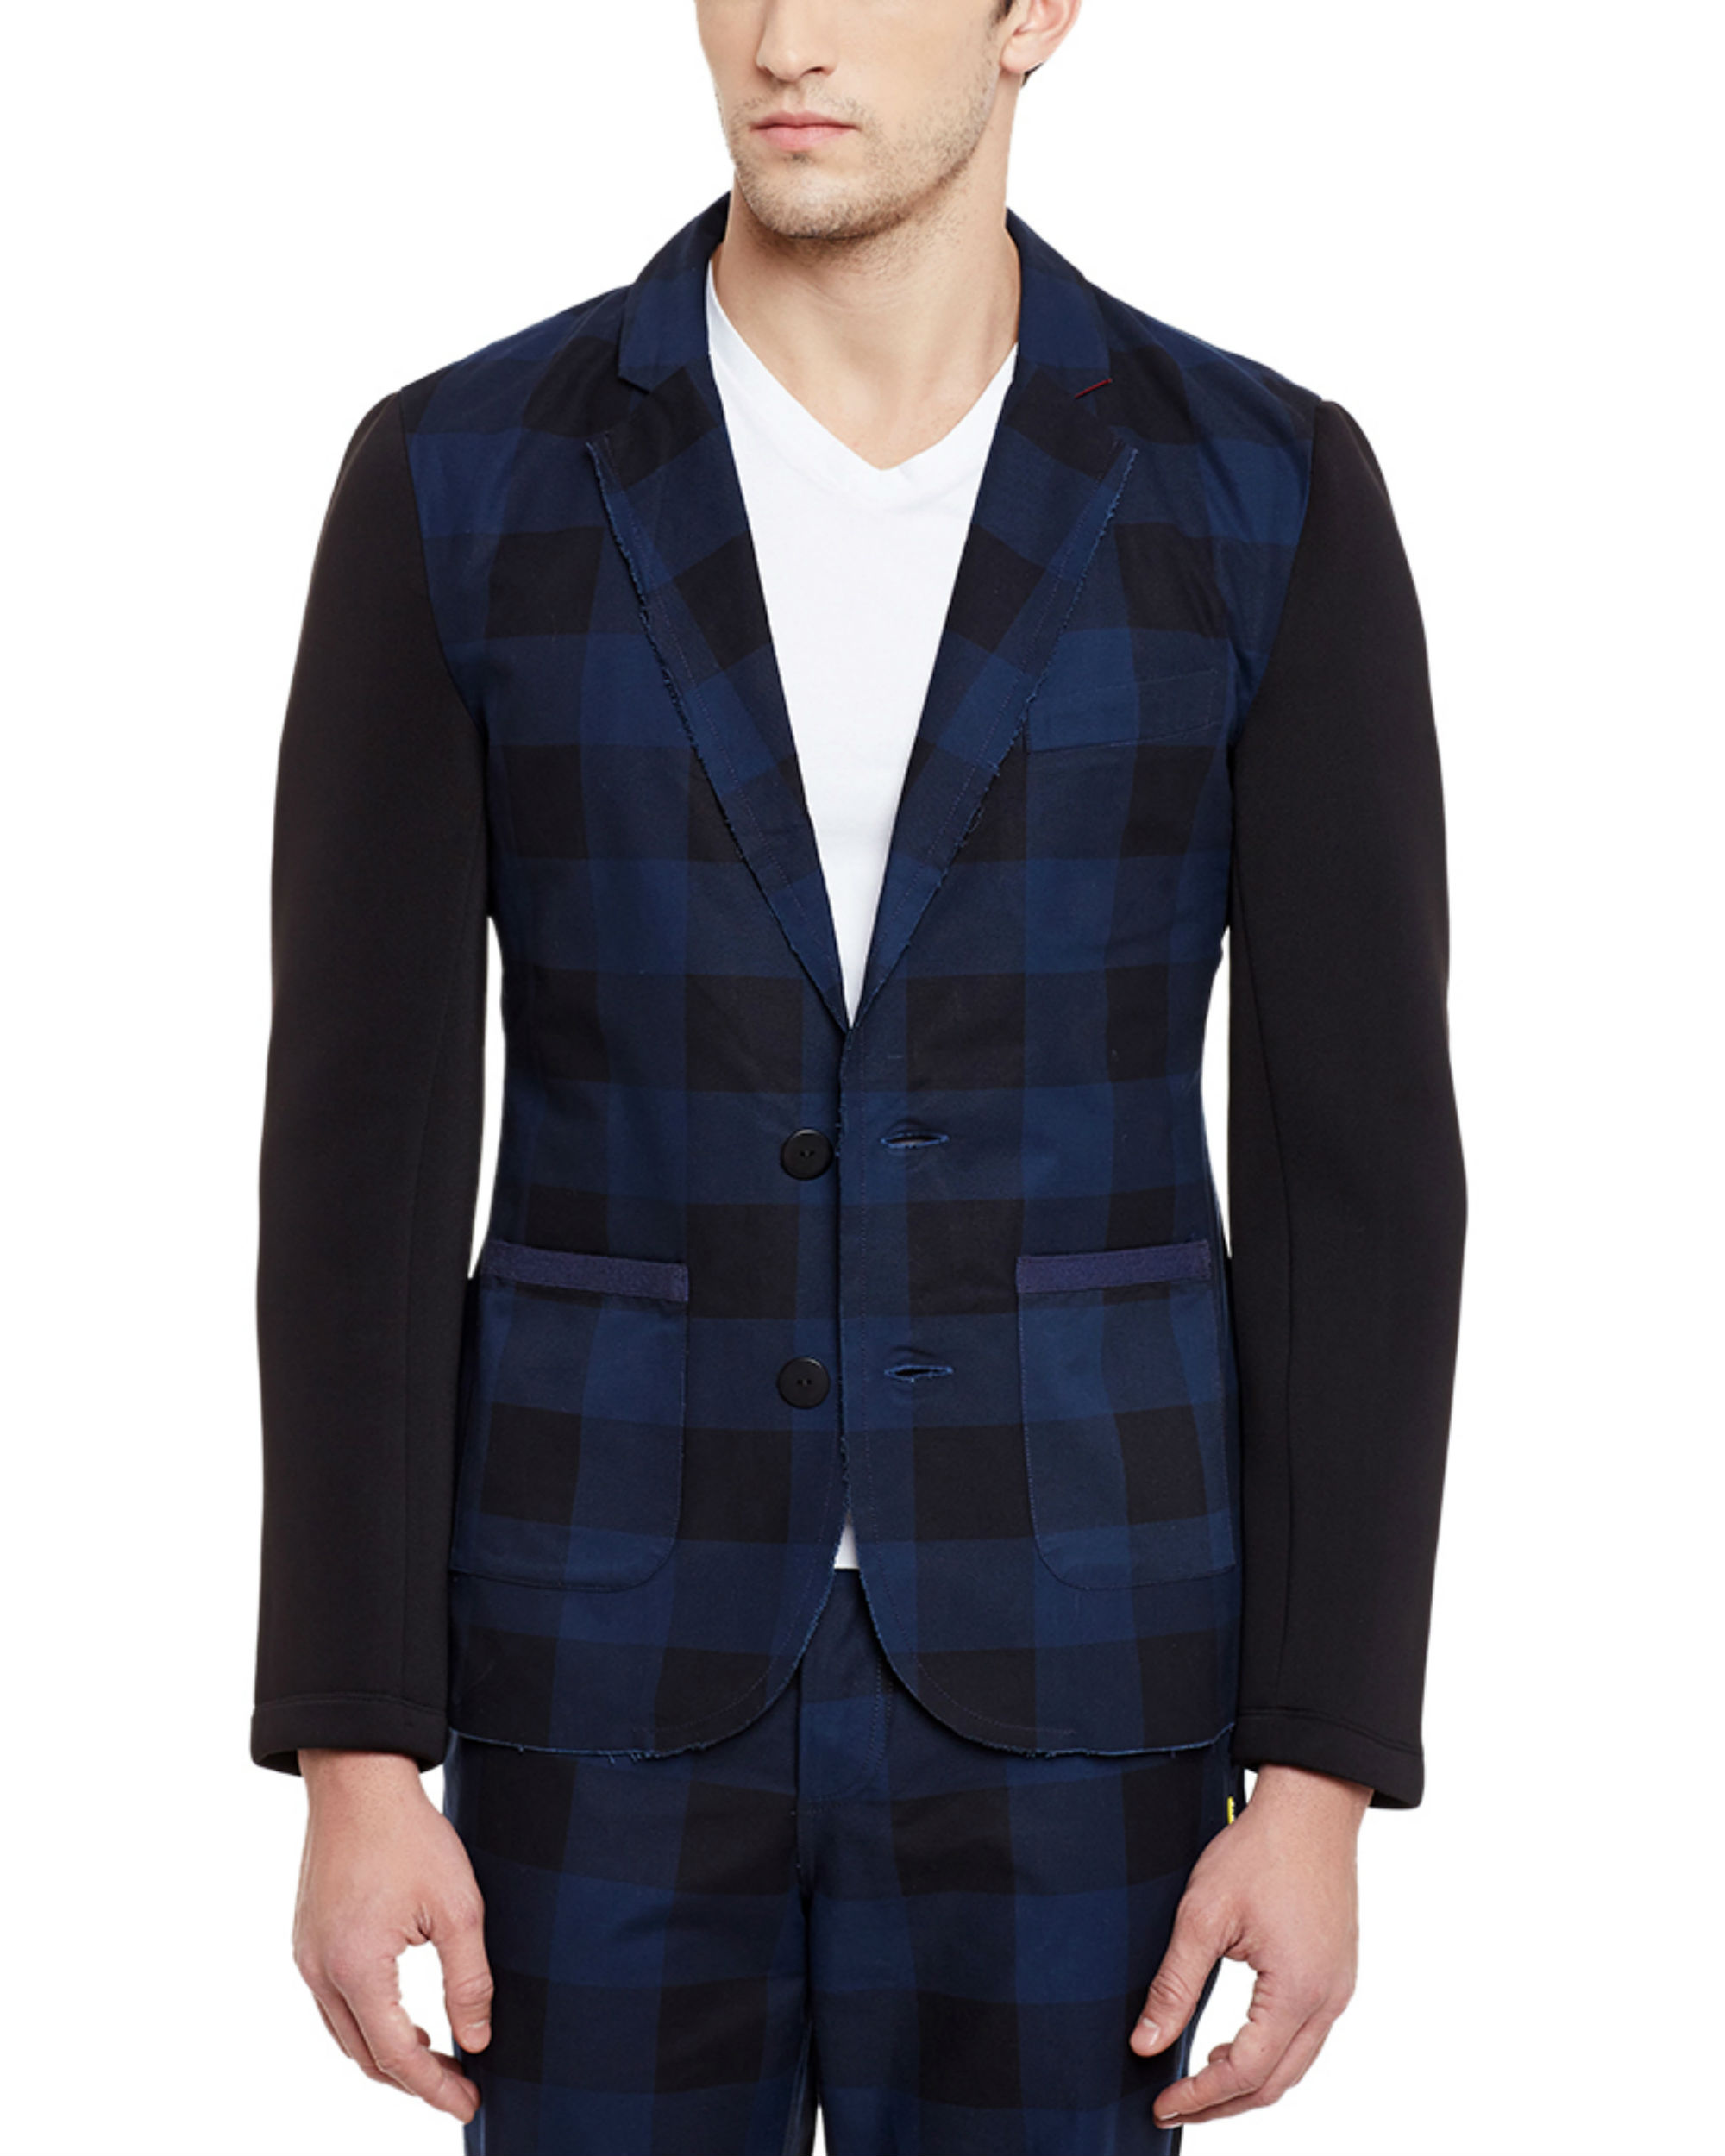 Checkered unlined summer blazer